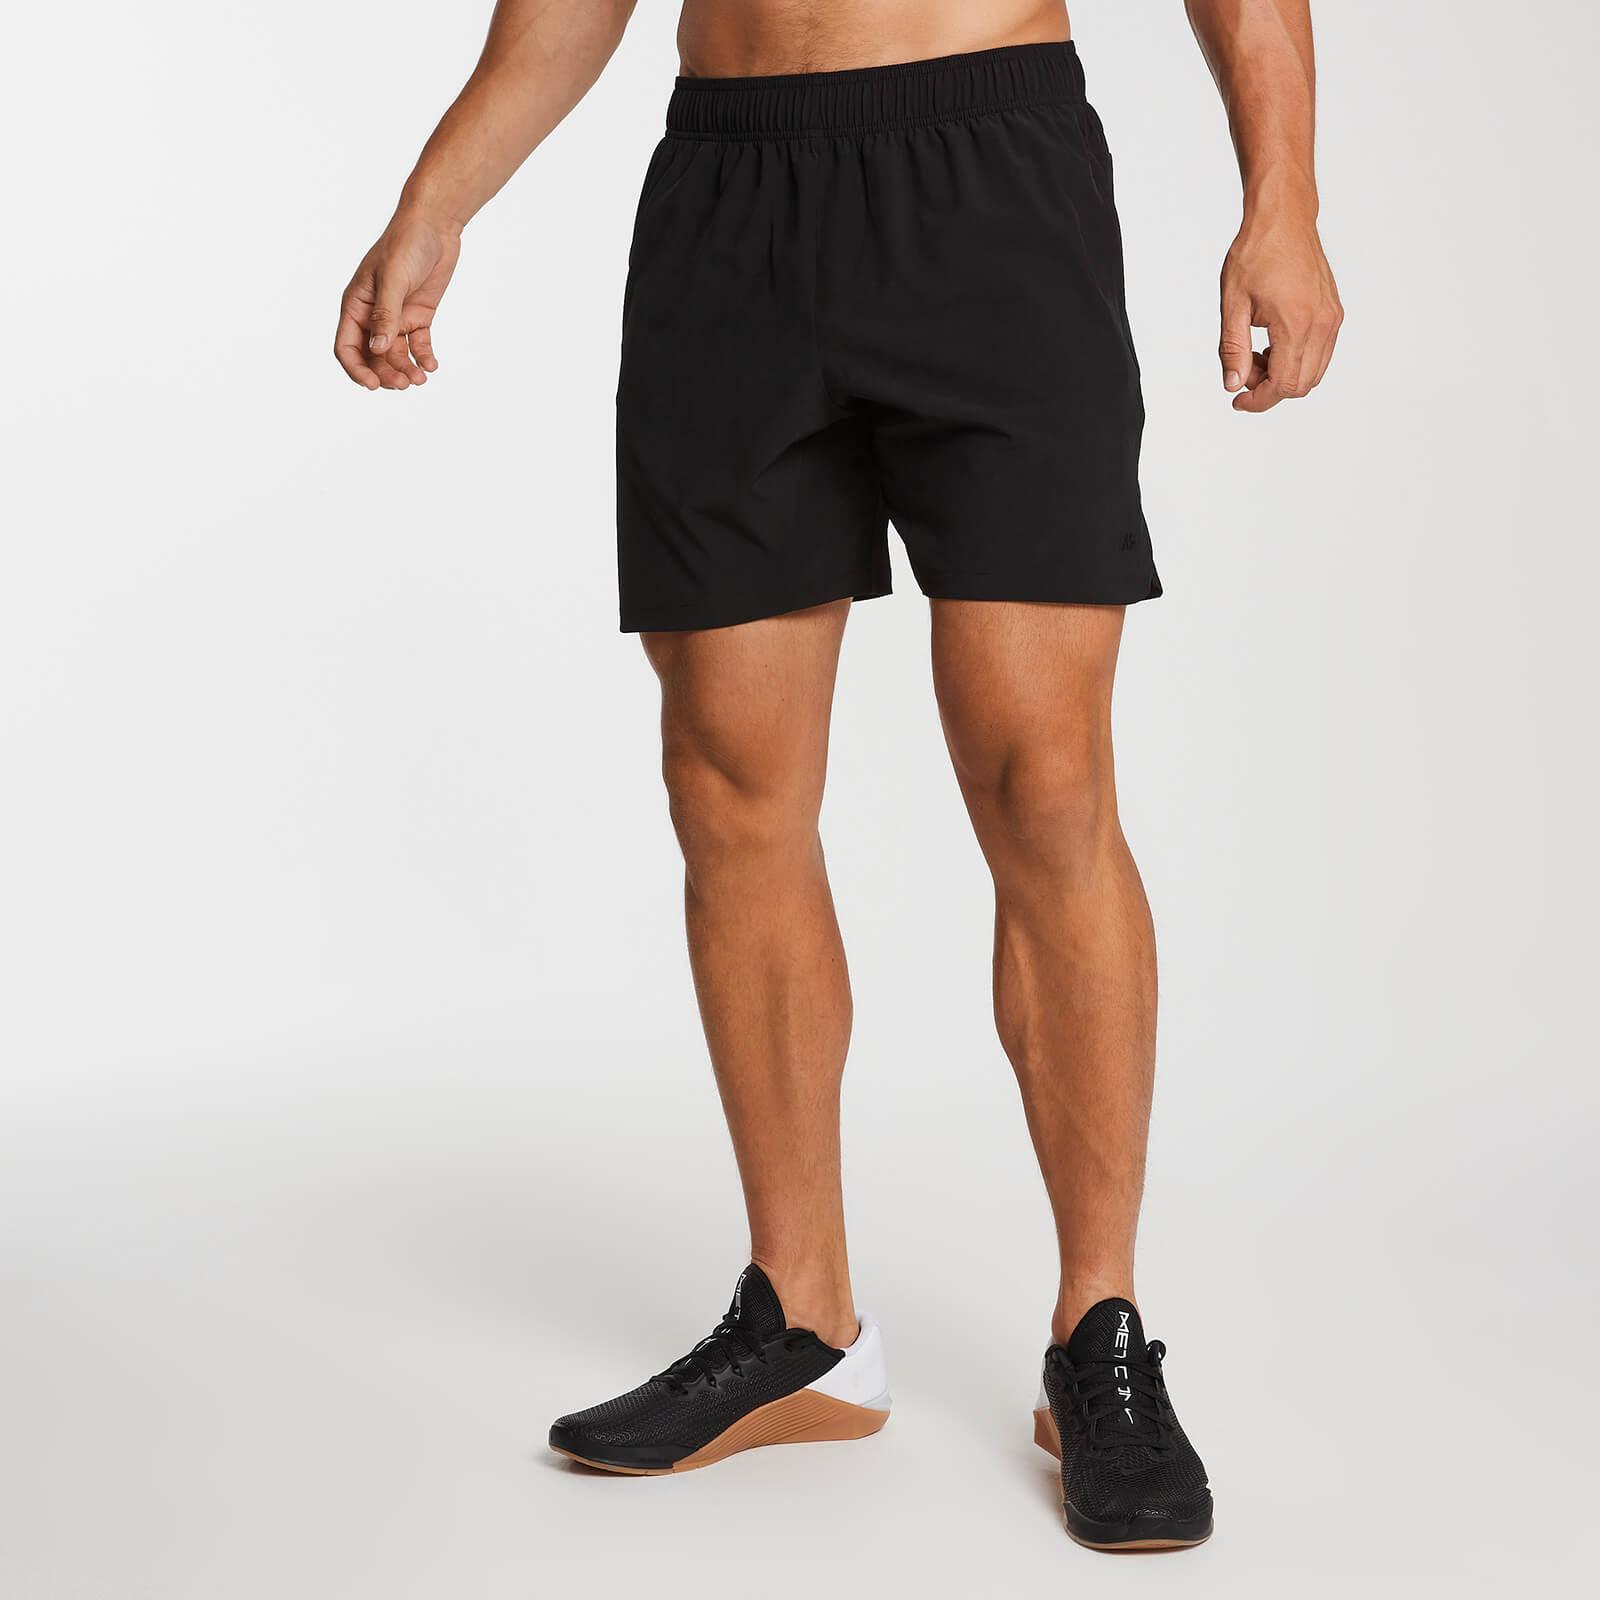 MP Essential Woven Training Shorts - Sort - L